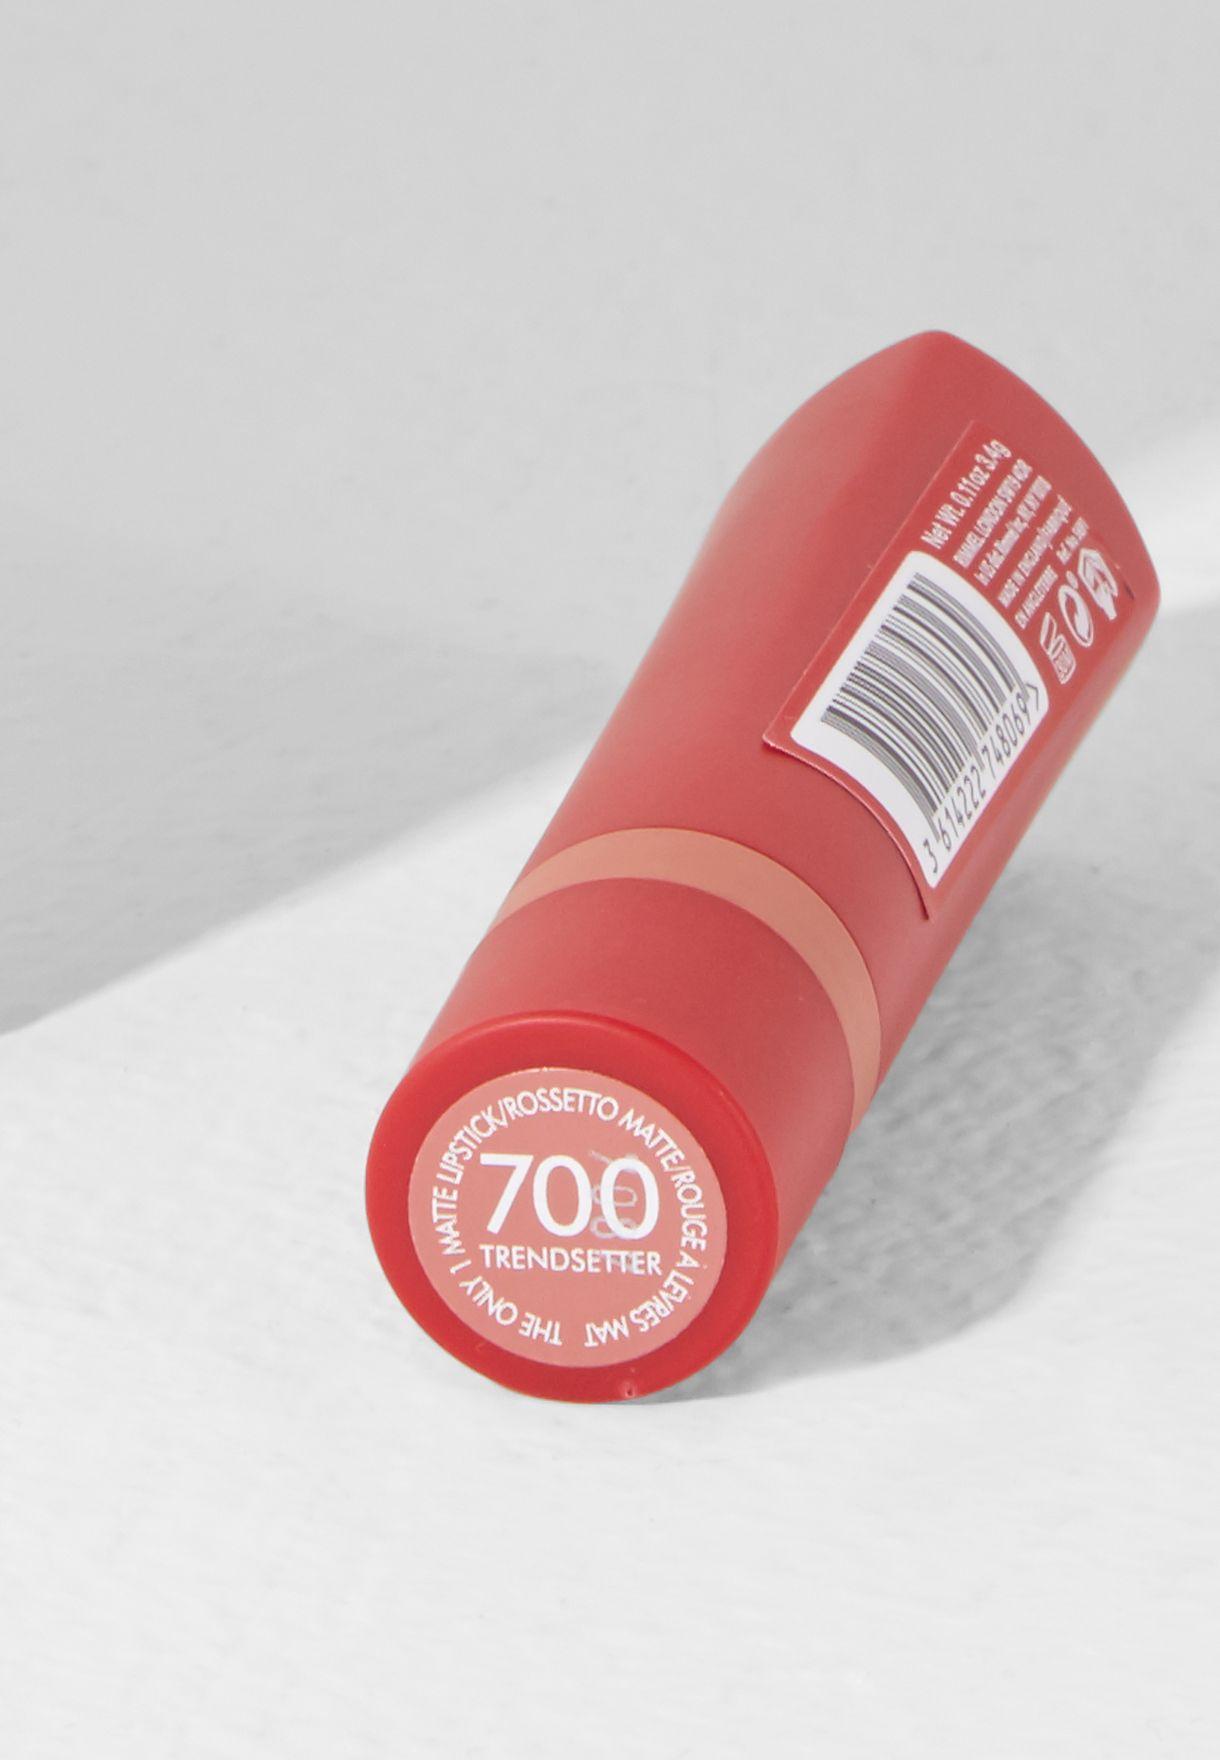 db0ec766e تسوق احمر شفاه ذا اونلي وان غير لامع ماركة ريميل لندن لون وردي ...